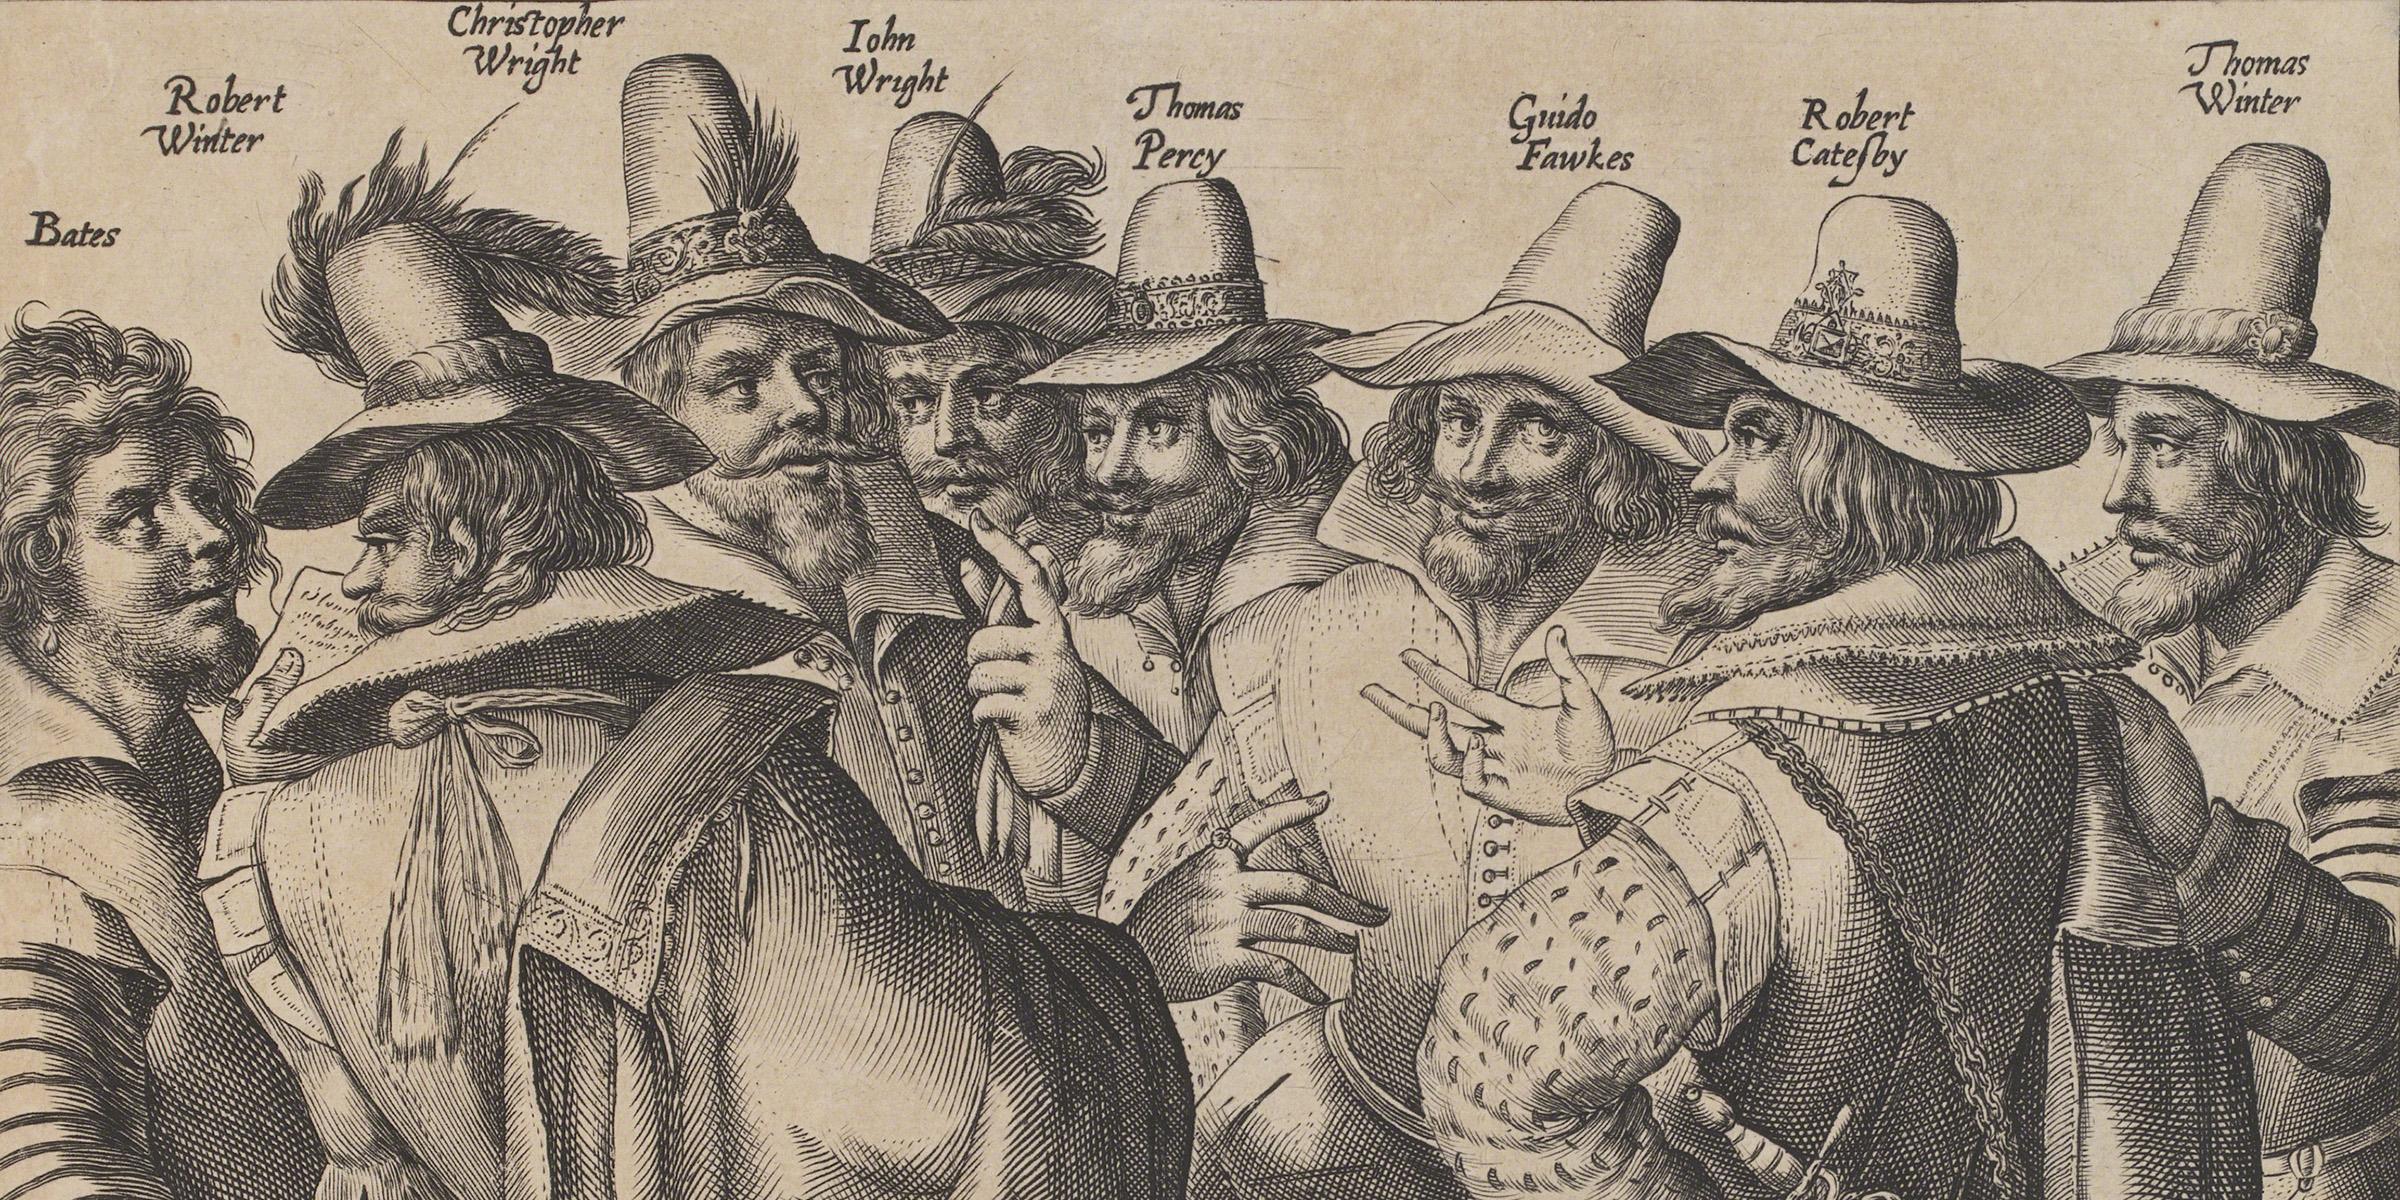 The Gunpowder Plot Conspirators (detail), by Crispijn de Passe the Elder, 1605. © National Portrait Gallery, London/Art Resource.